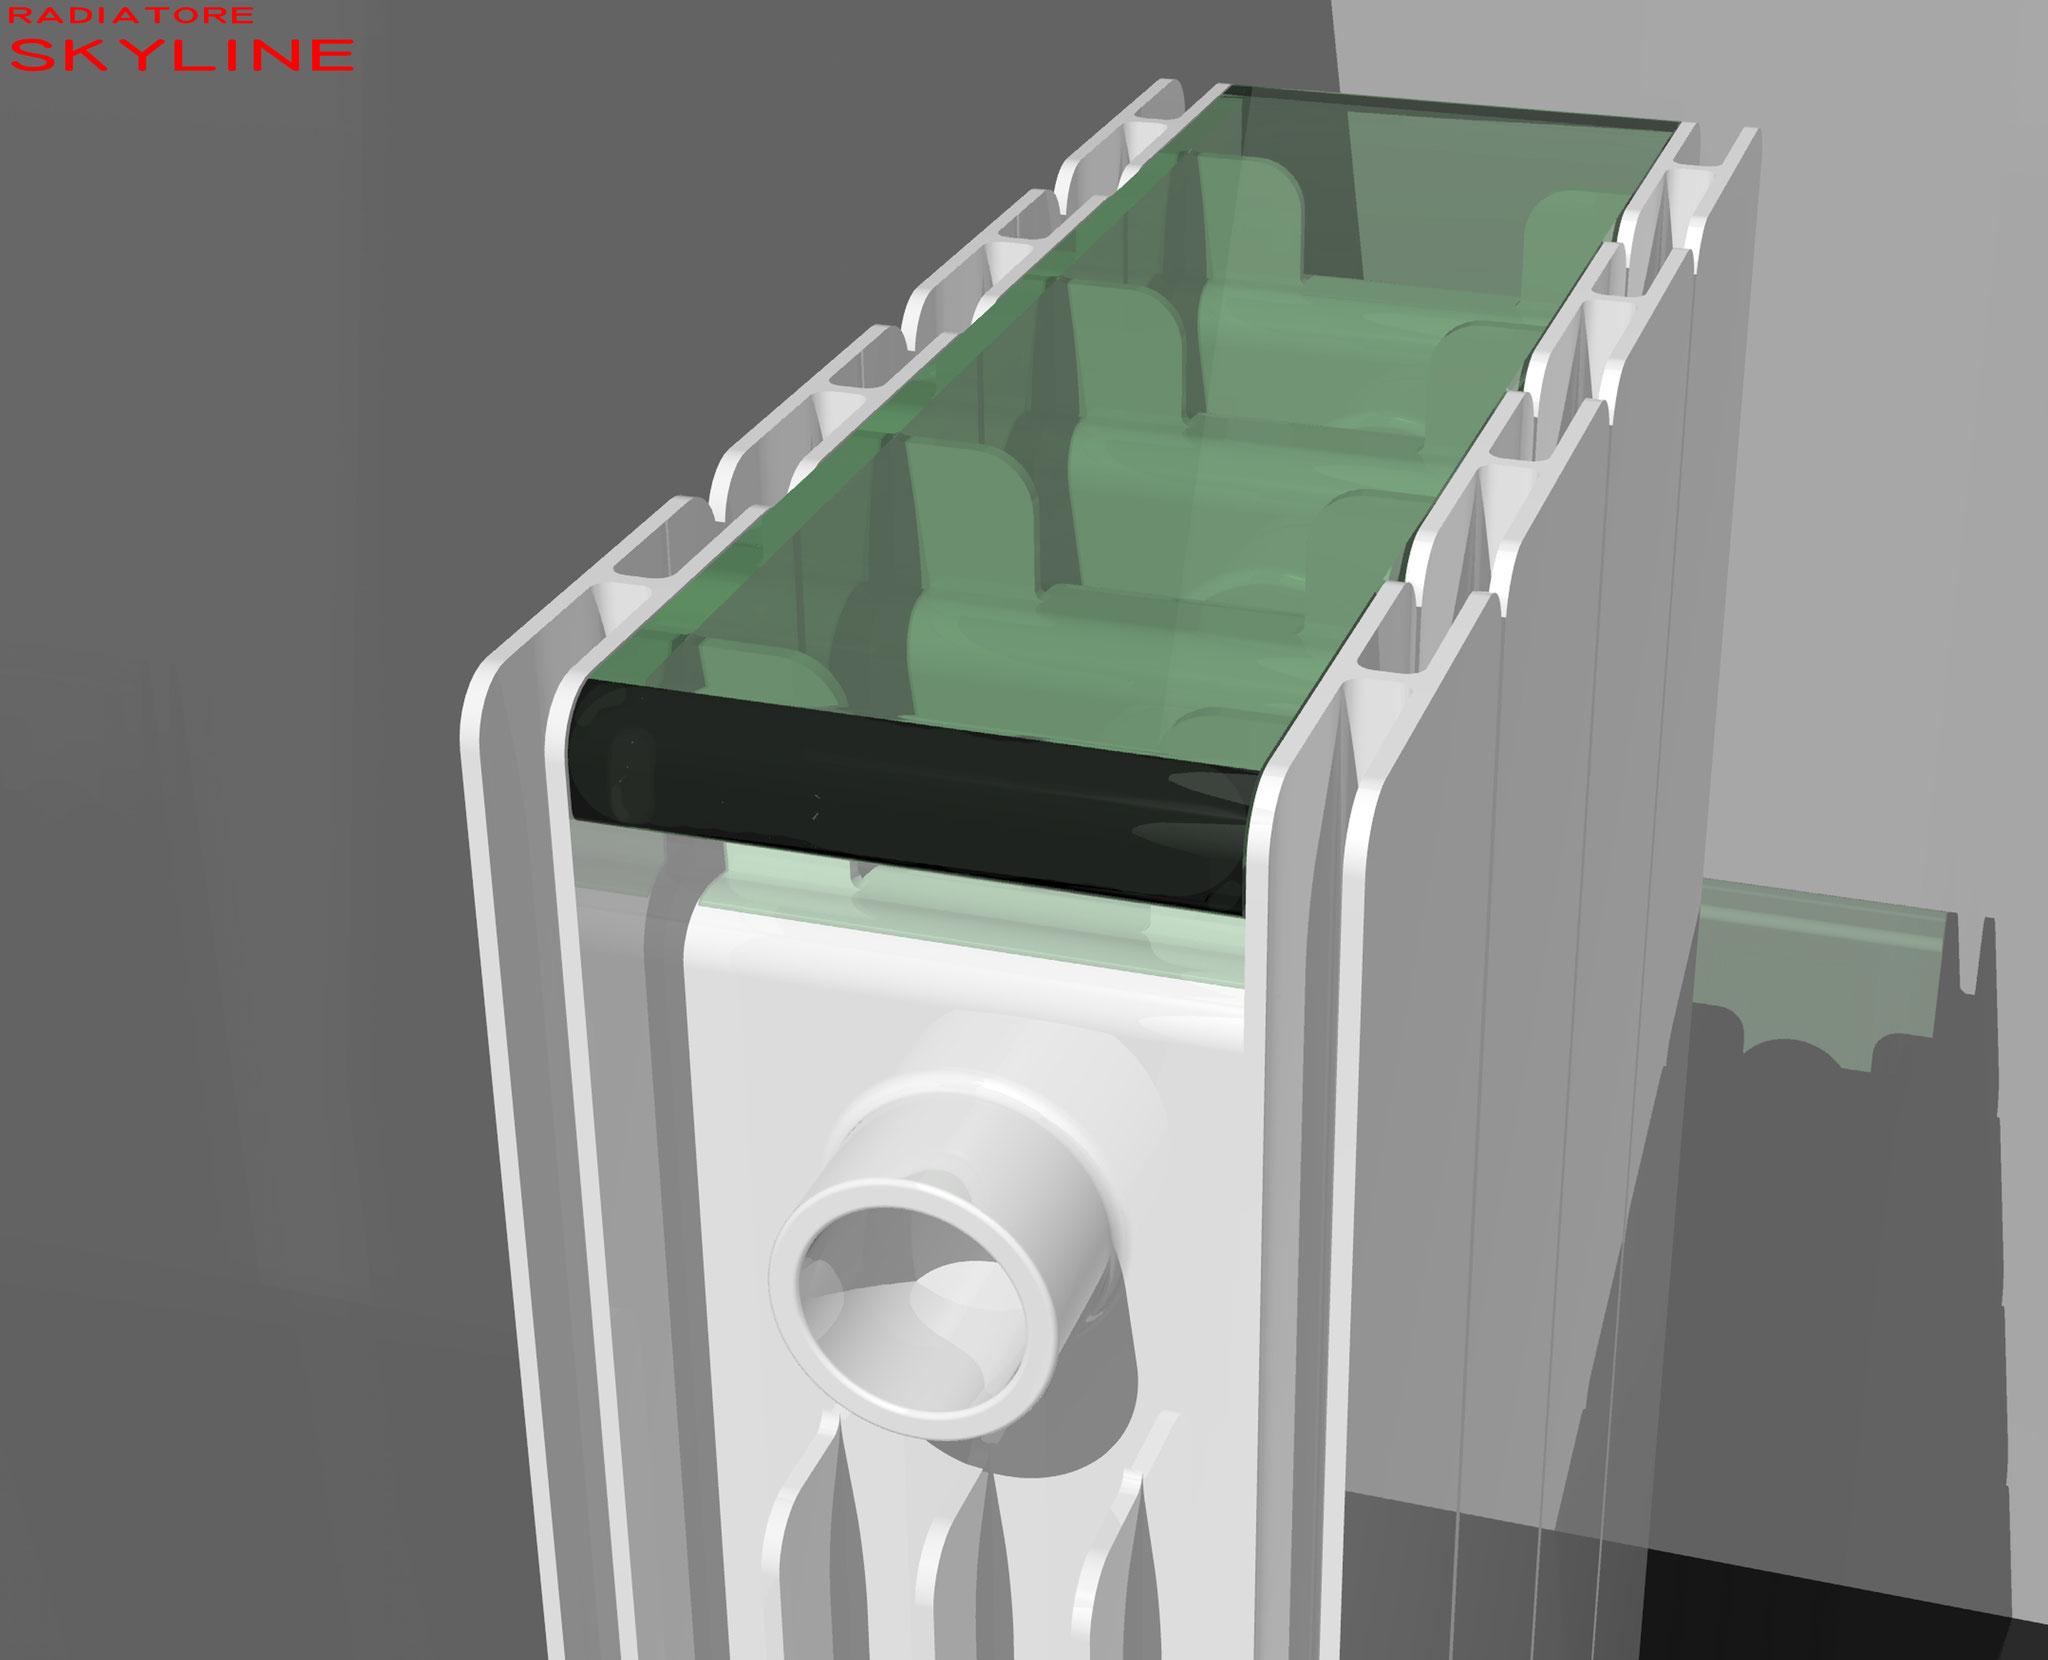 Skyline - Studio radiatore 2008 ADHOC Gruppo Ragaini   rendering.